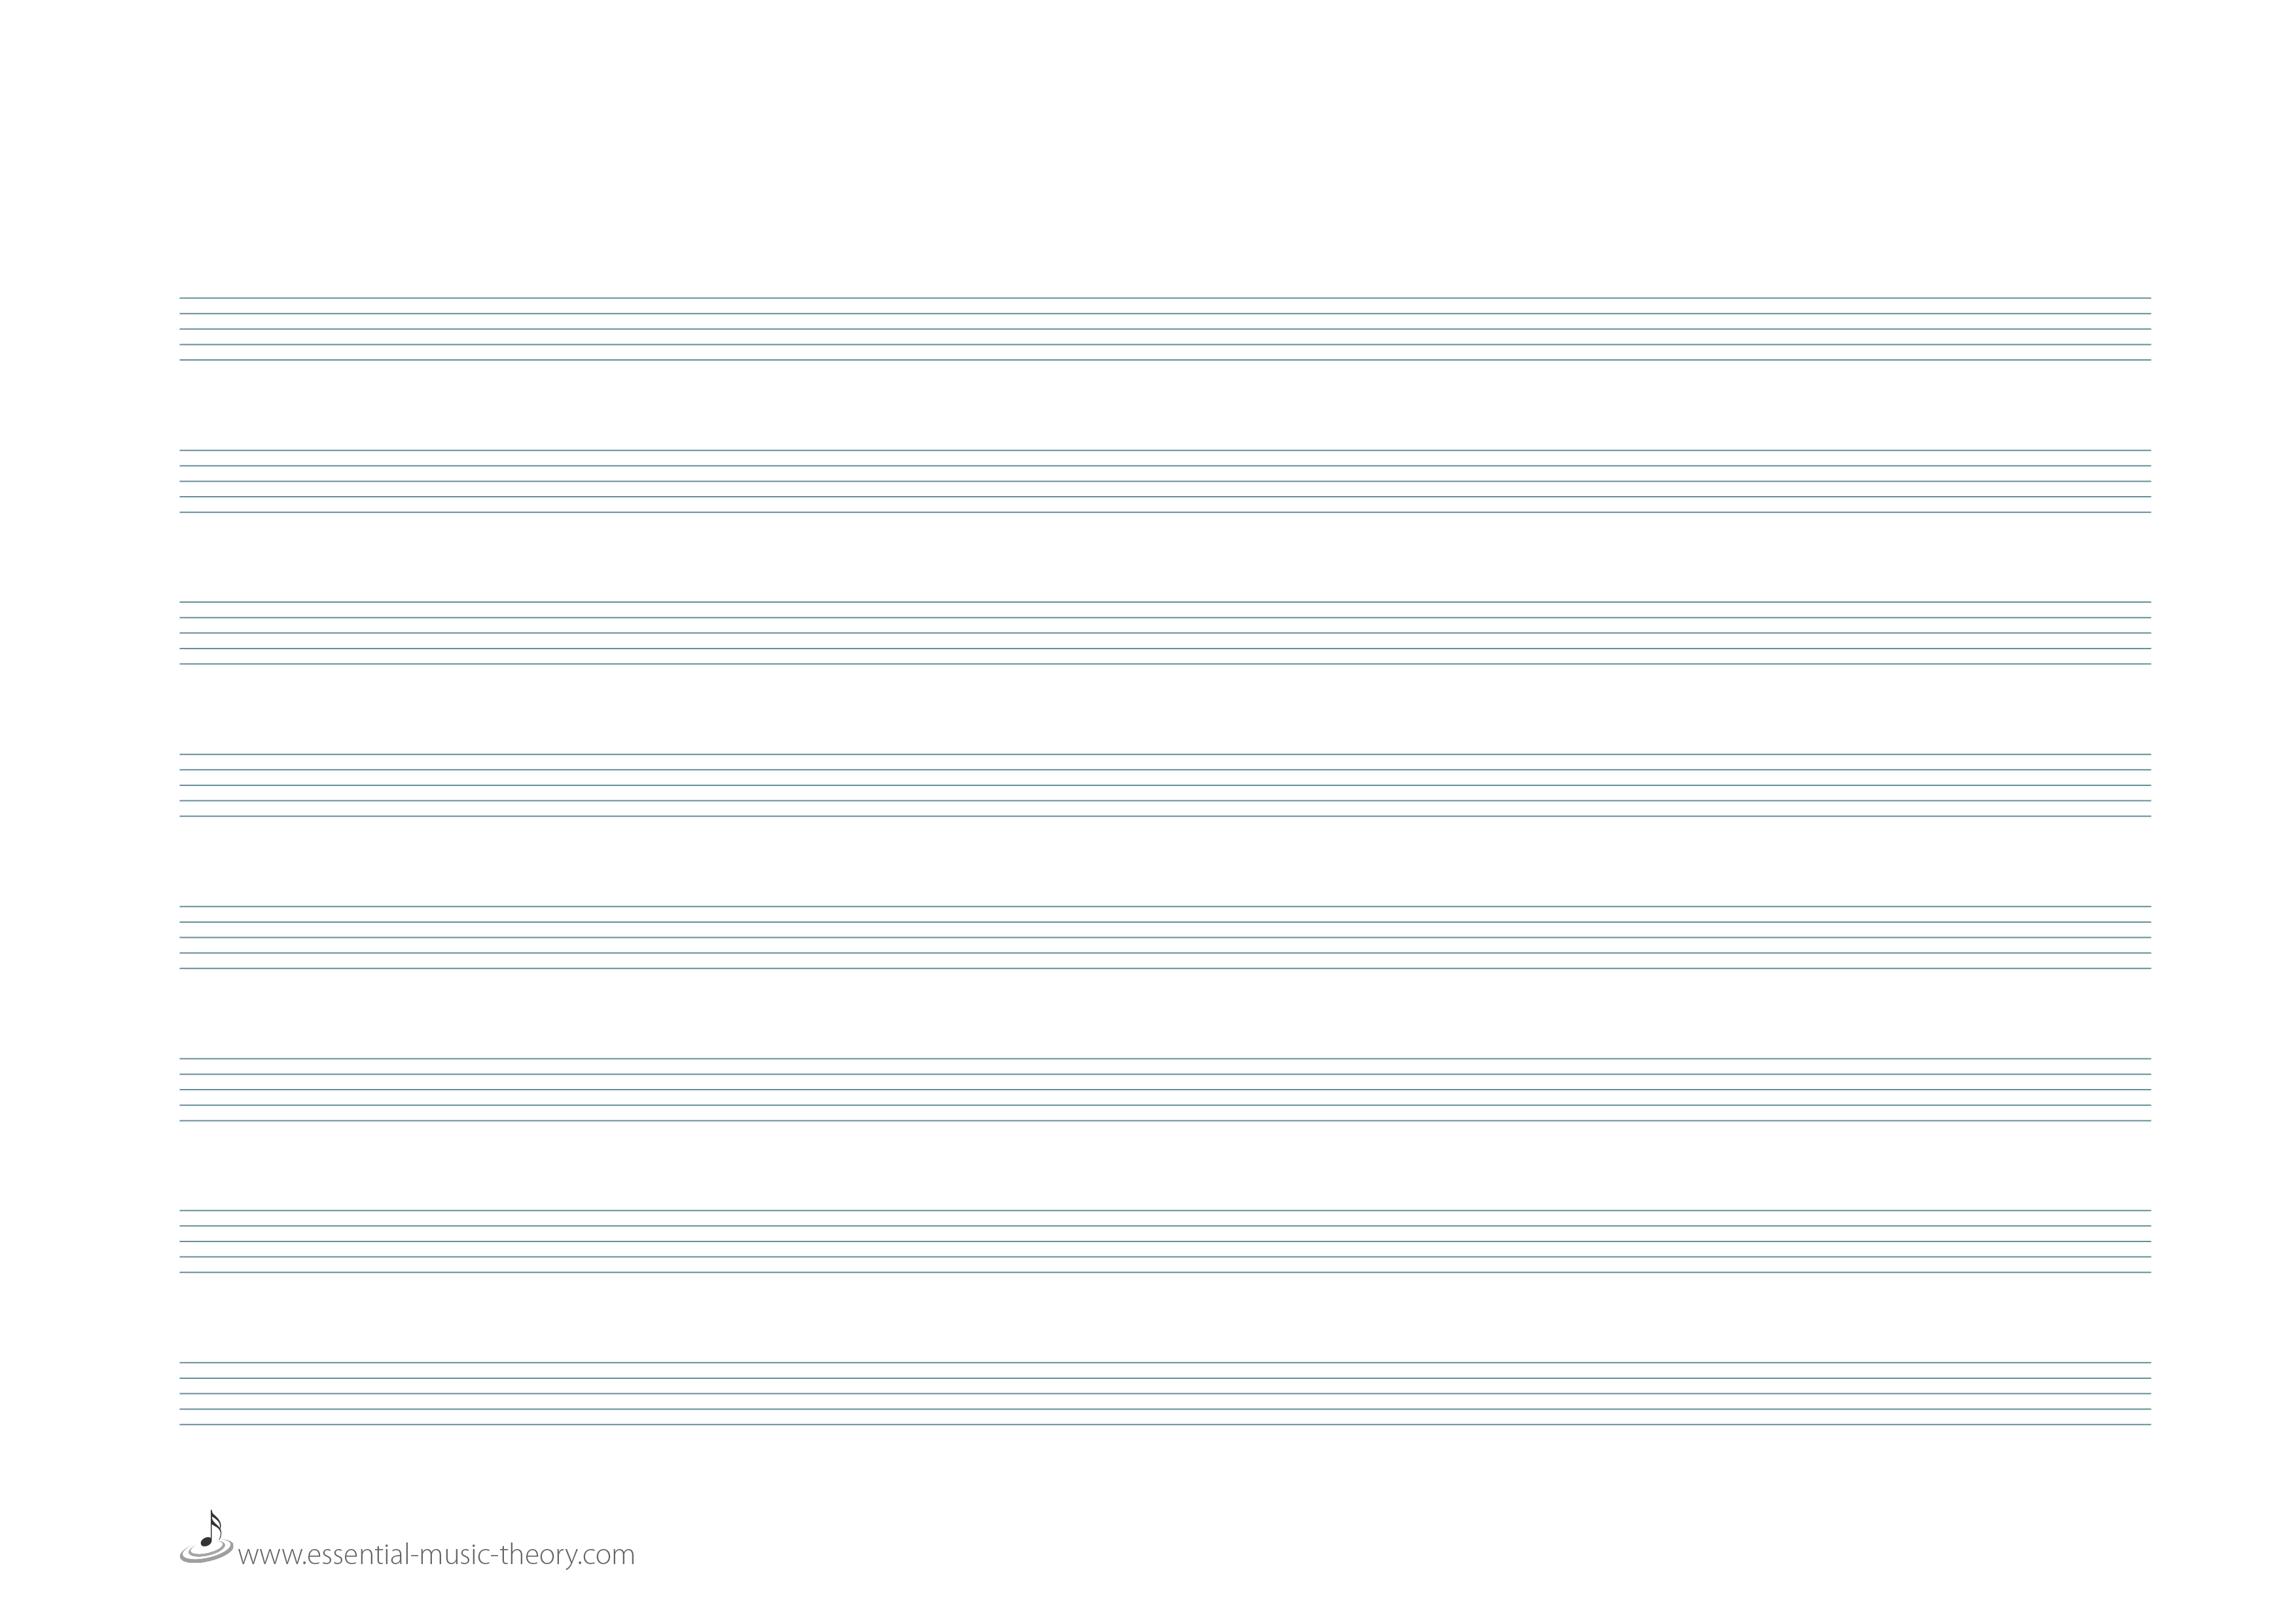 Blank Manuscript Paper - Free Printable Blank Sheet Music